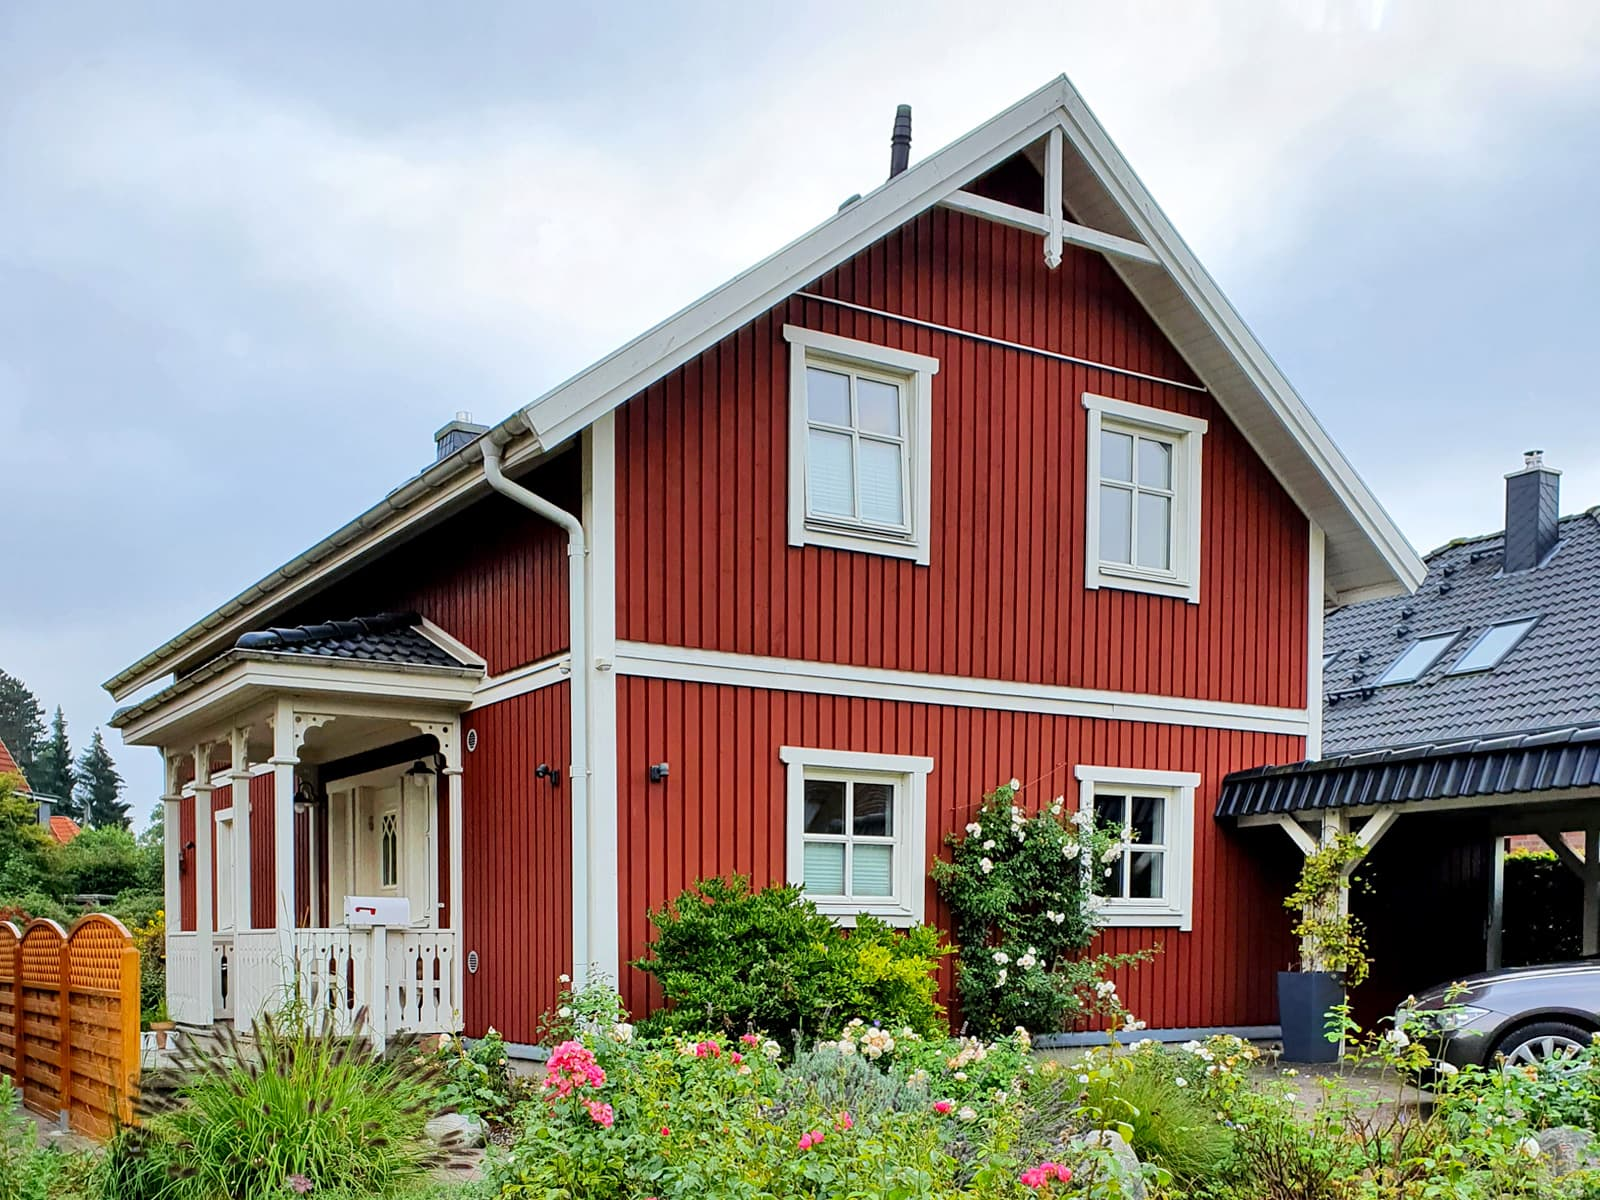 Immobilienmakler Halstenbek